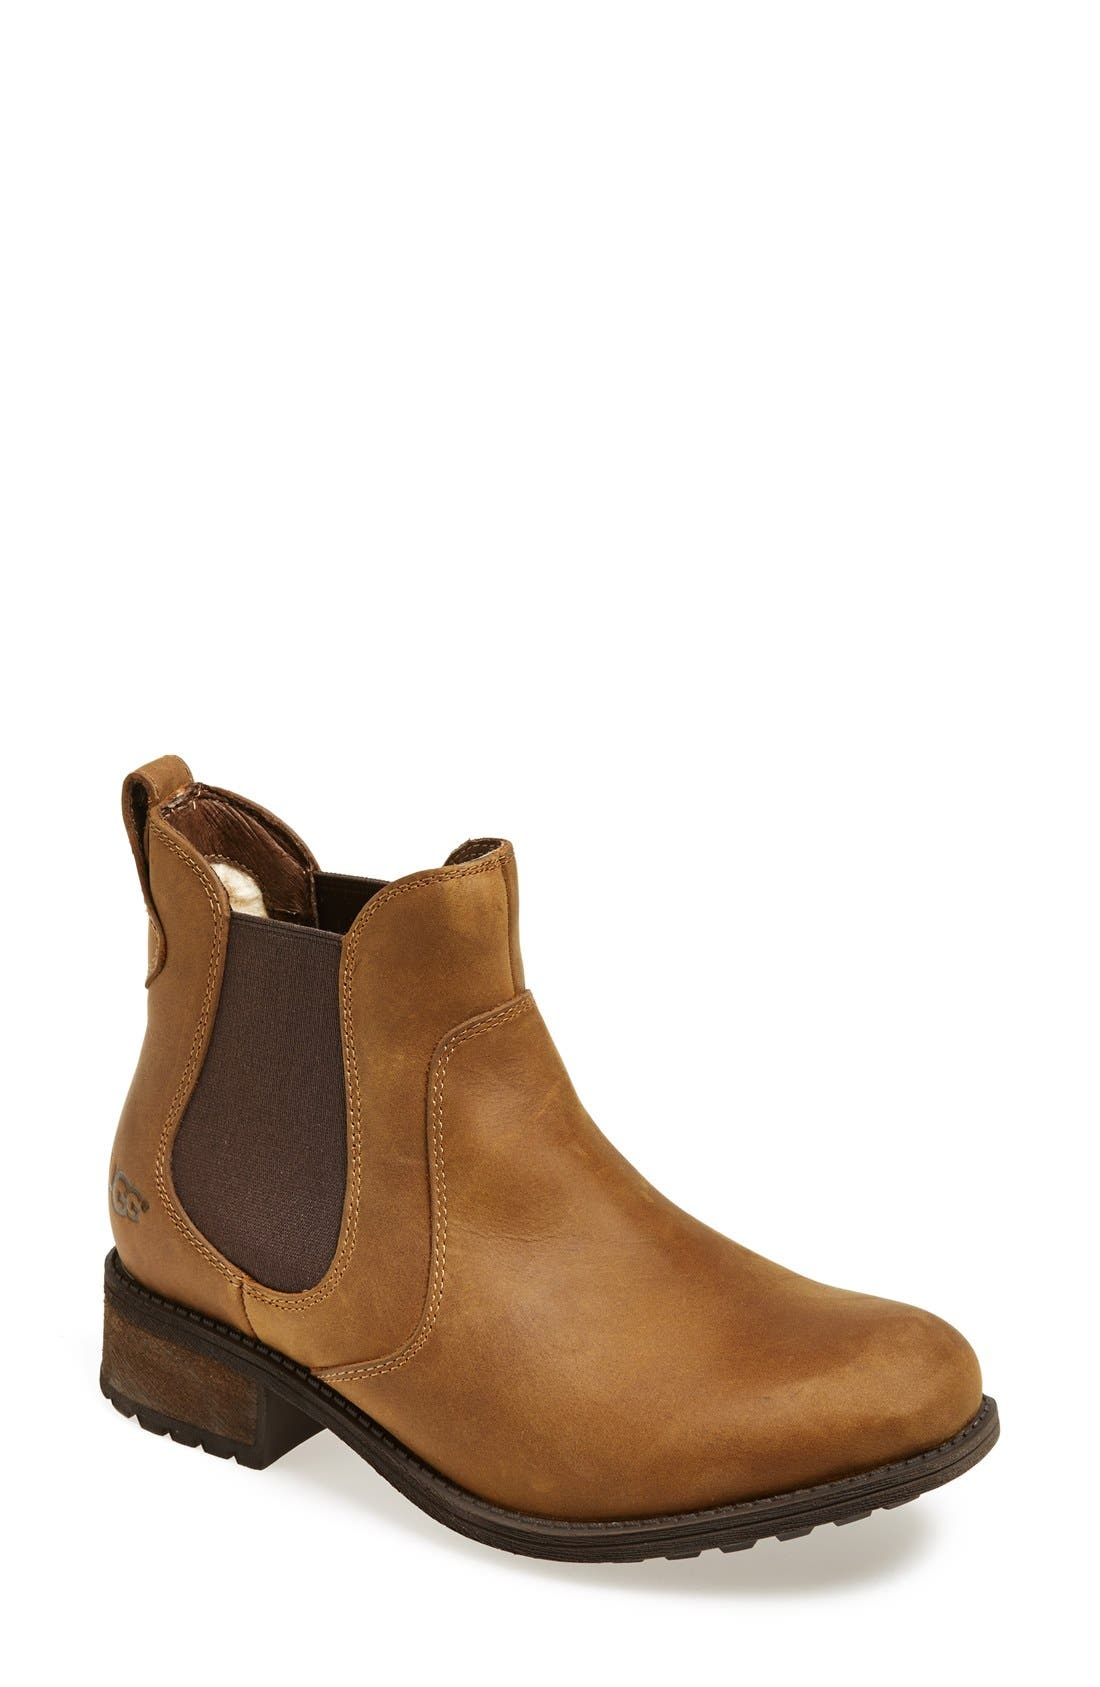 Main Image - UGG® Australia 'Bonham' Water Resistant Chelsea Boot (Women)